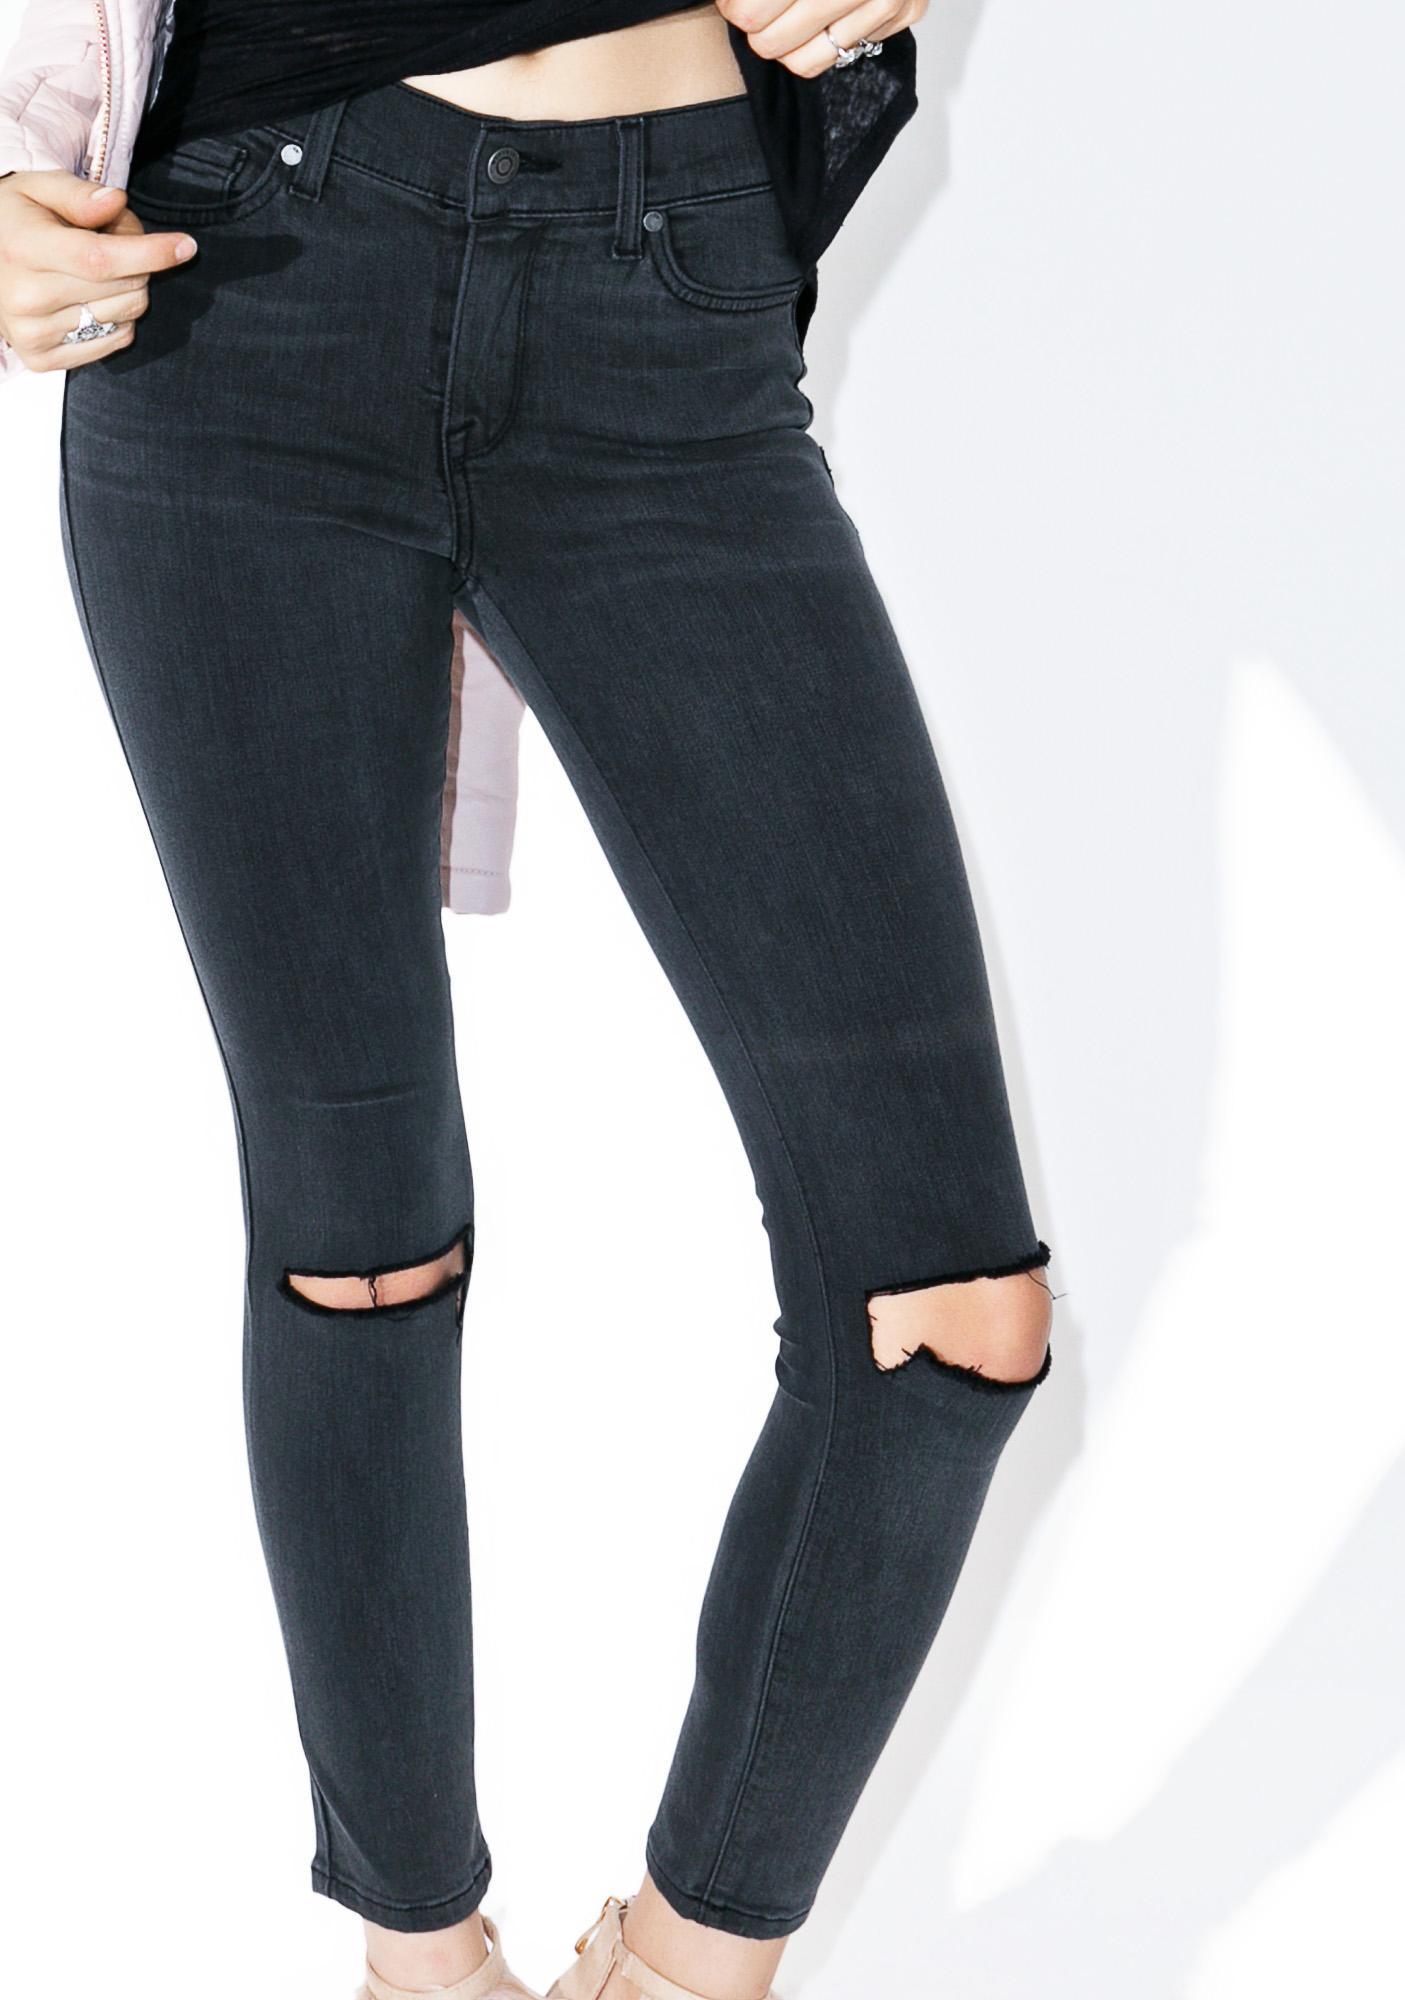 Fall 2 Knees Slit Jeans